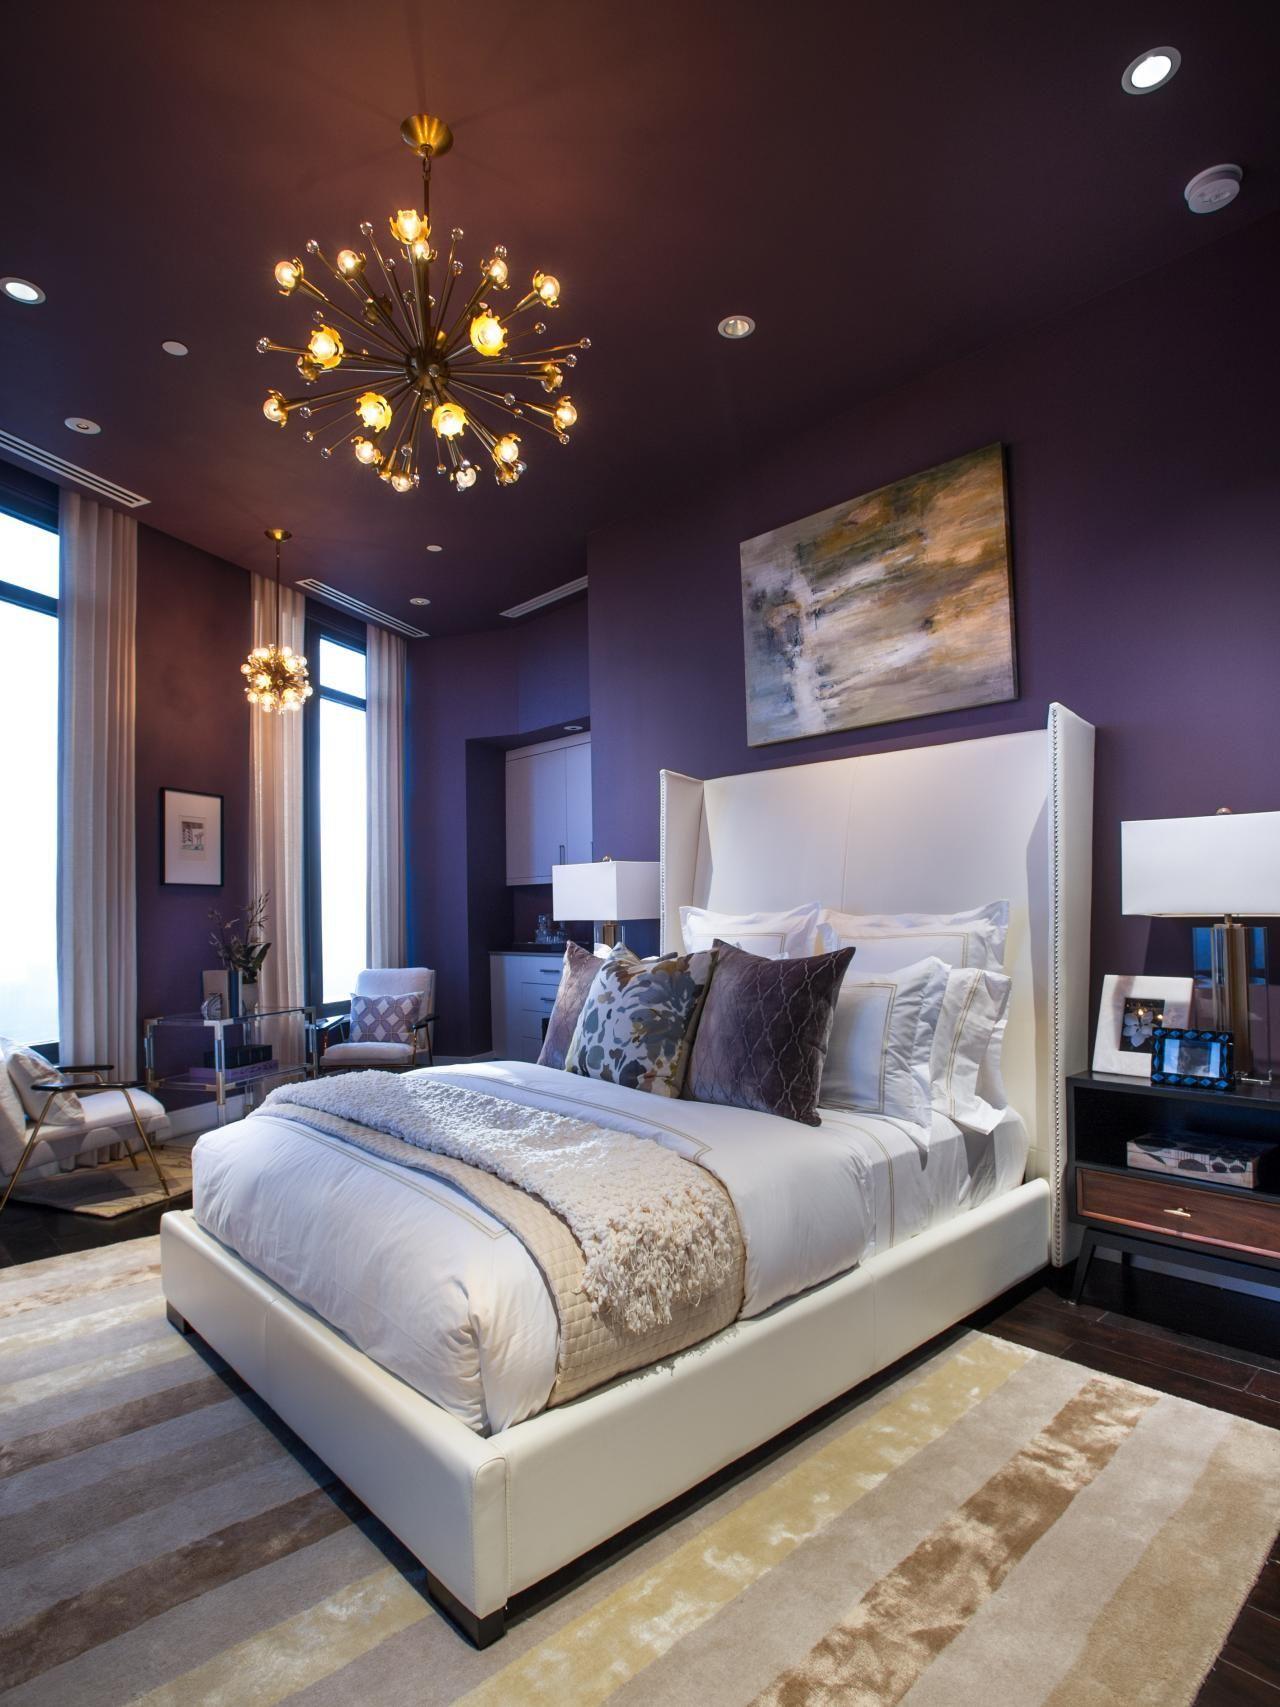 Small Bedroom Decor Bedroomwalldecor Farmhouse Bedroom Decor Romantic Bedroom Purple Master Bedroom Bedroom Paint Color Inspiration Master Bedroom Interior Bedroom paint ideas purple